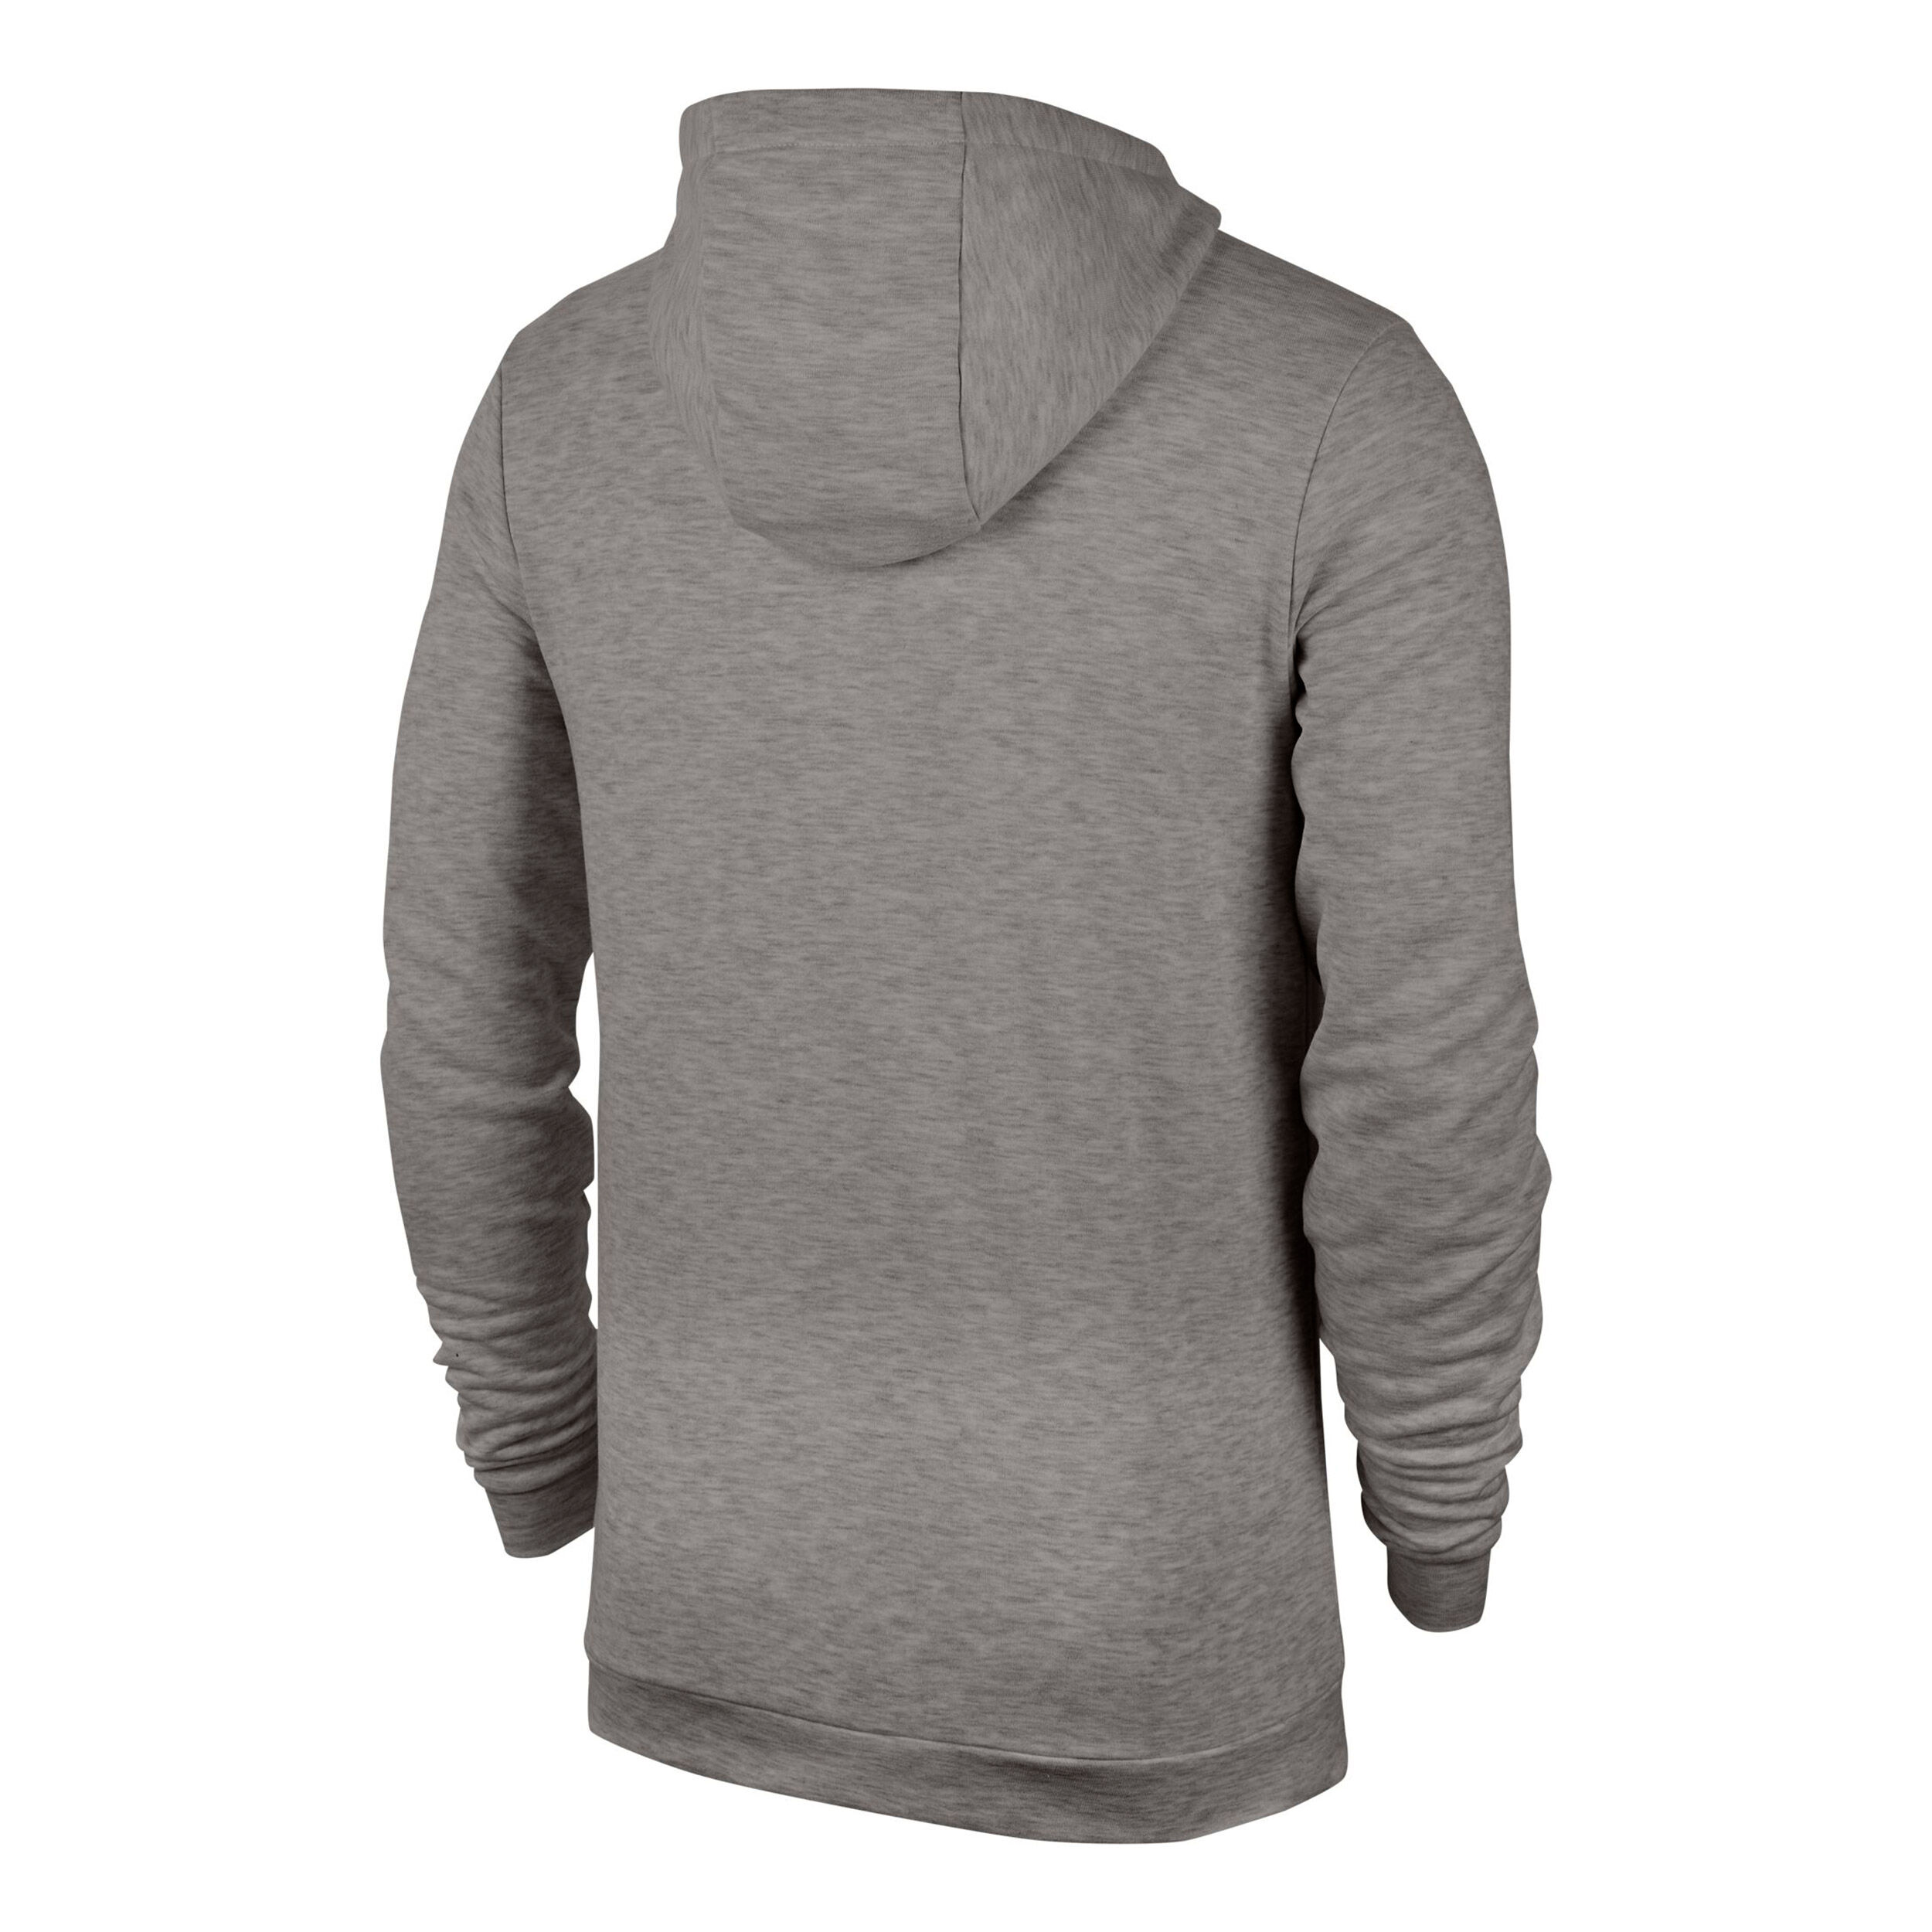 Nike Dry Sweatjacke Herren Grau, Schwarz online kaufen